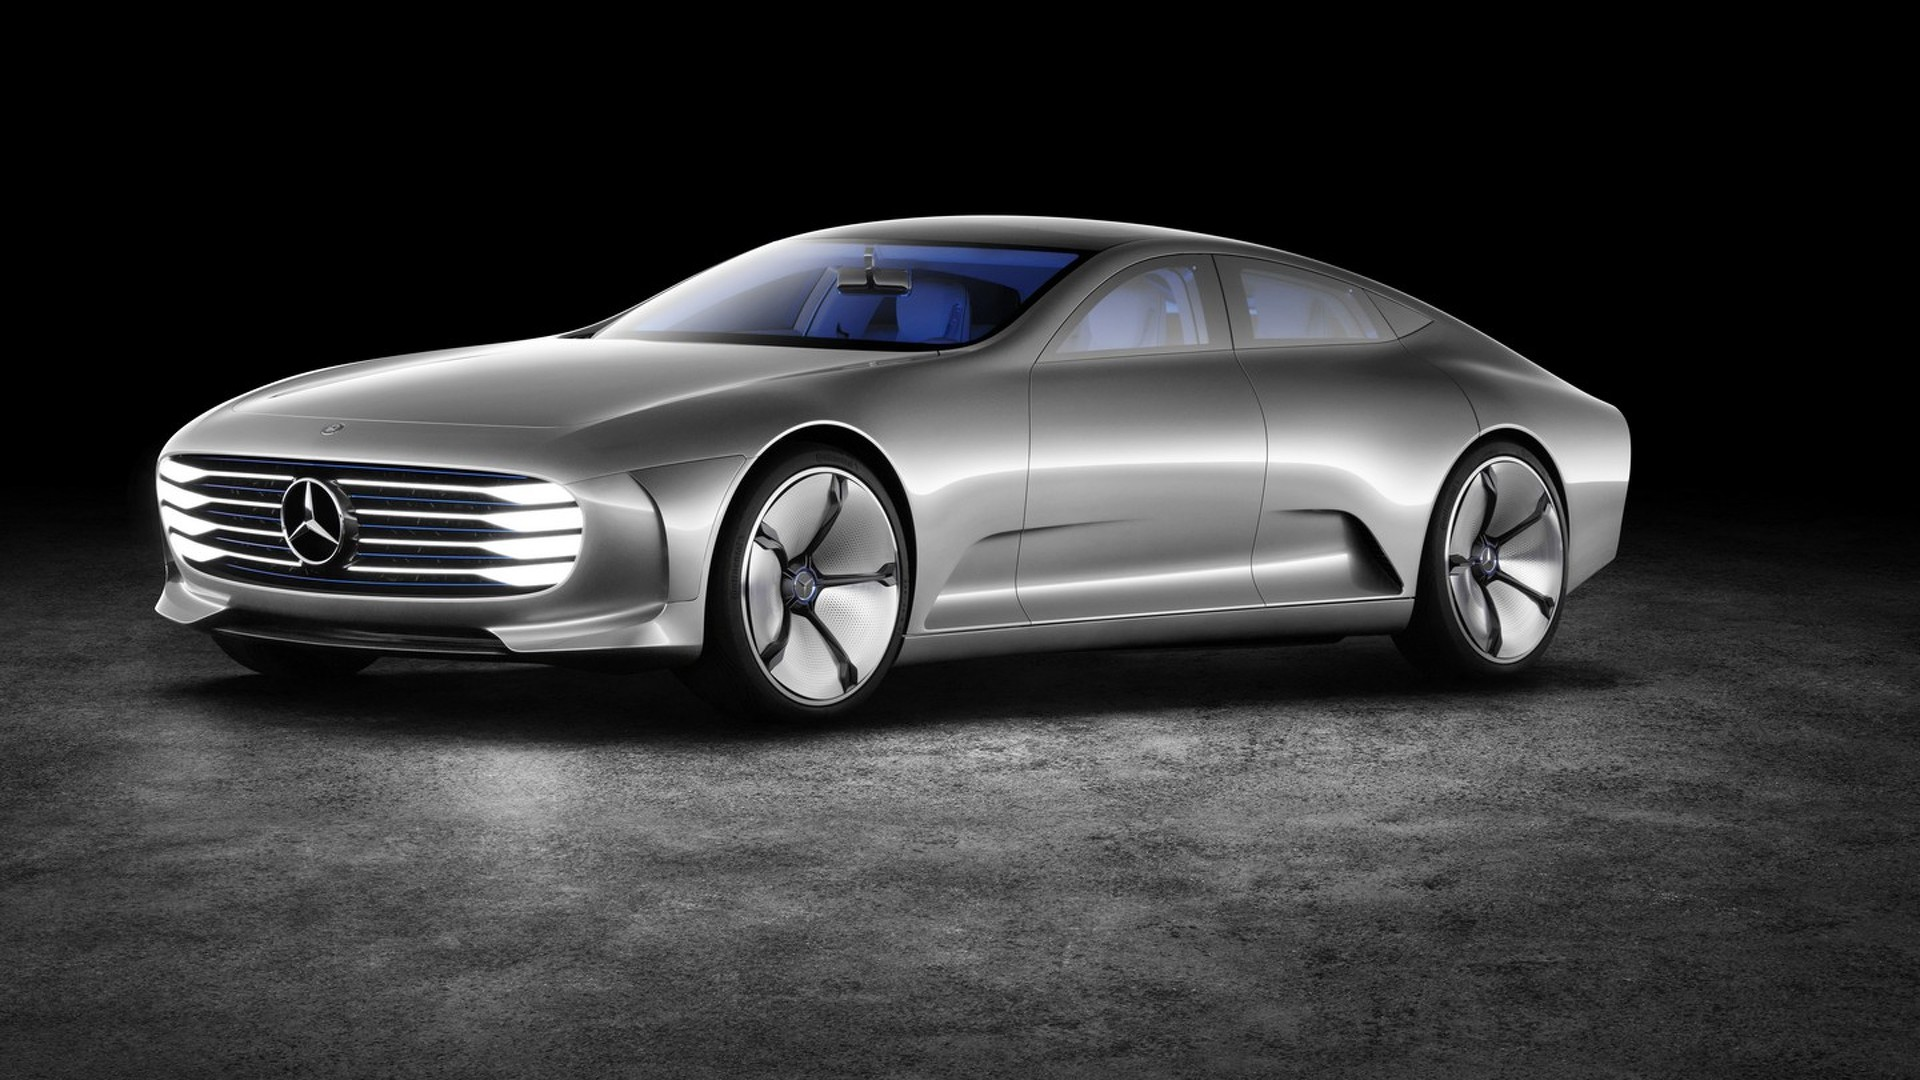 Mercedes\' EV range to target ultra-low drag coefficient via active aero